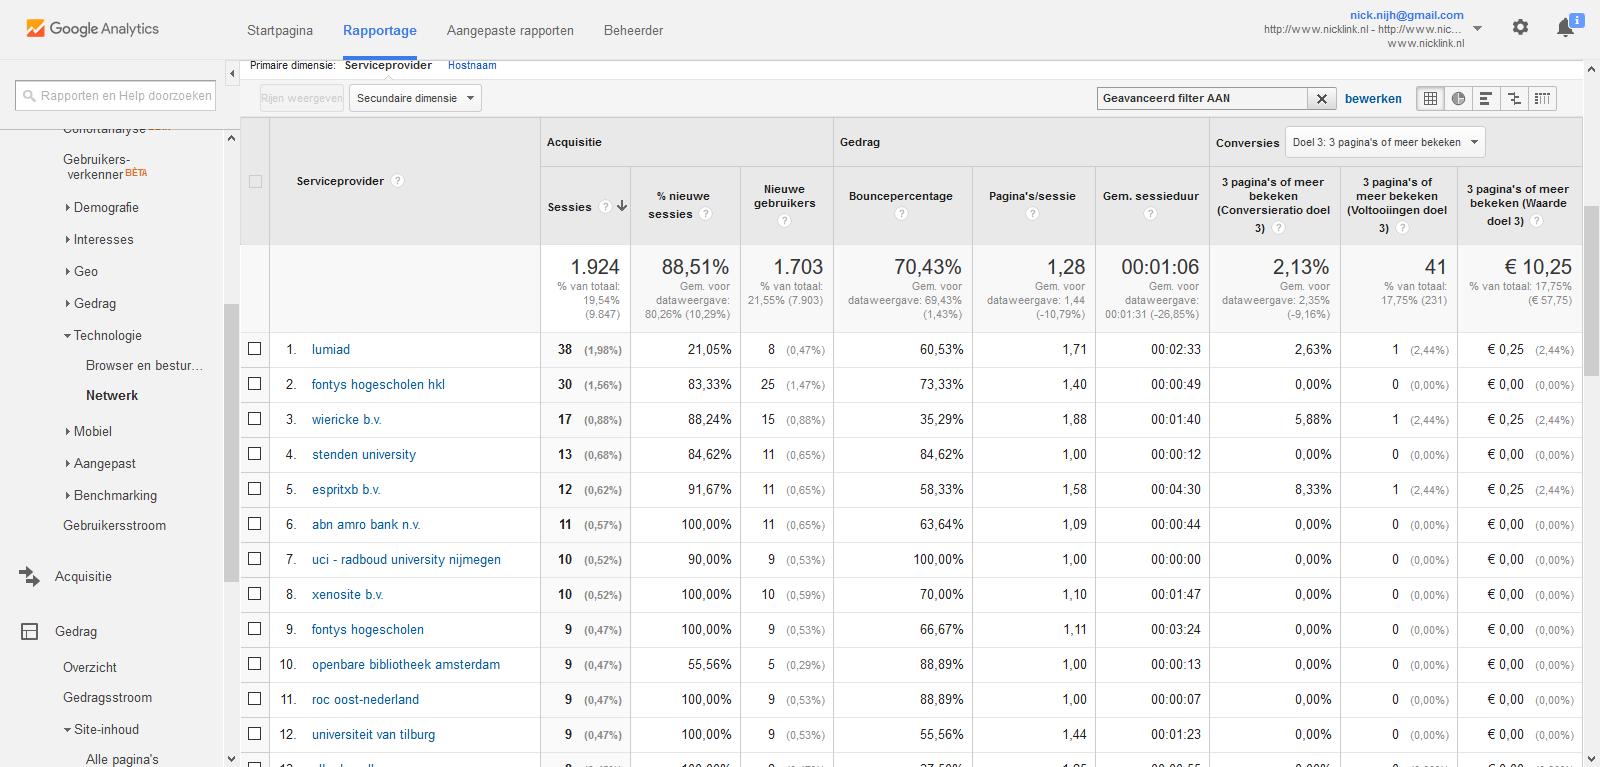 Google Analytics rapportage netwerk gefilterd zakelijke prospects